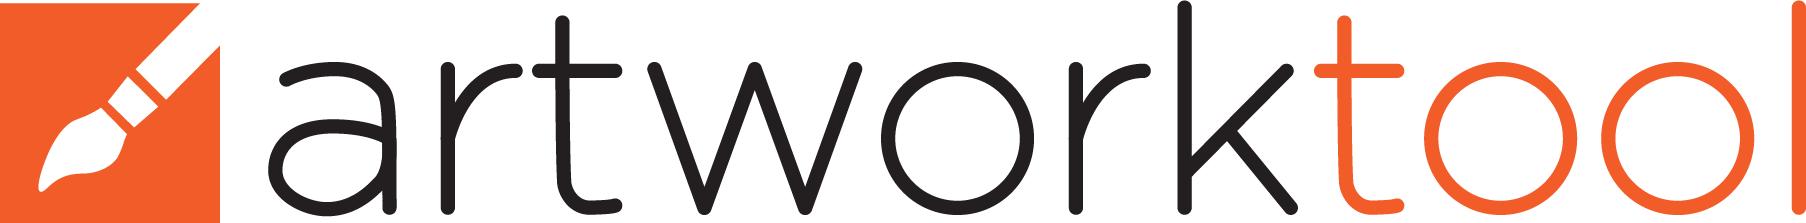 Artworktool logo traditional